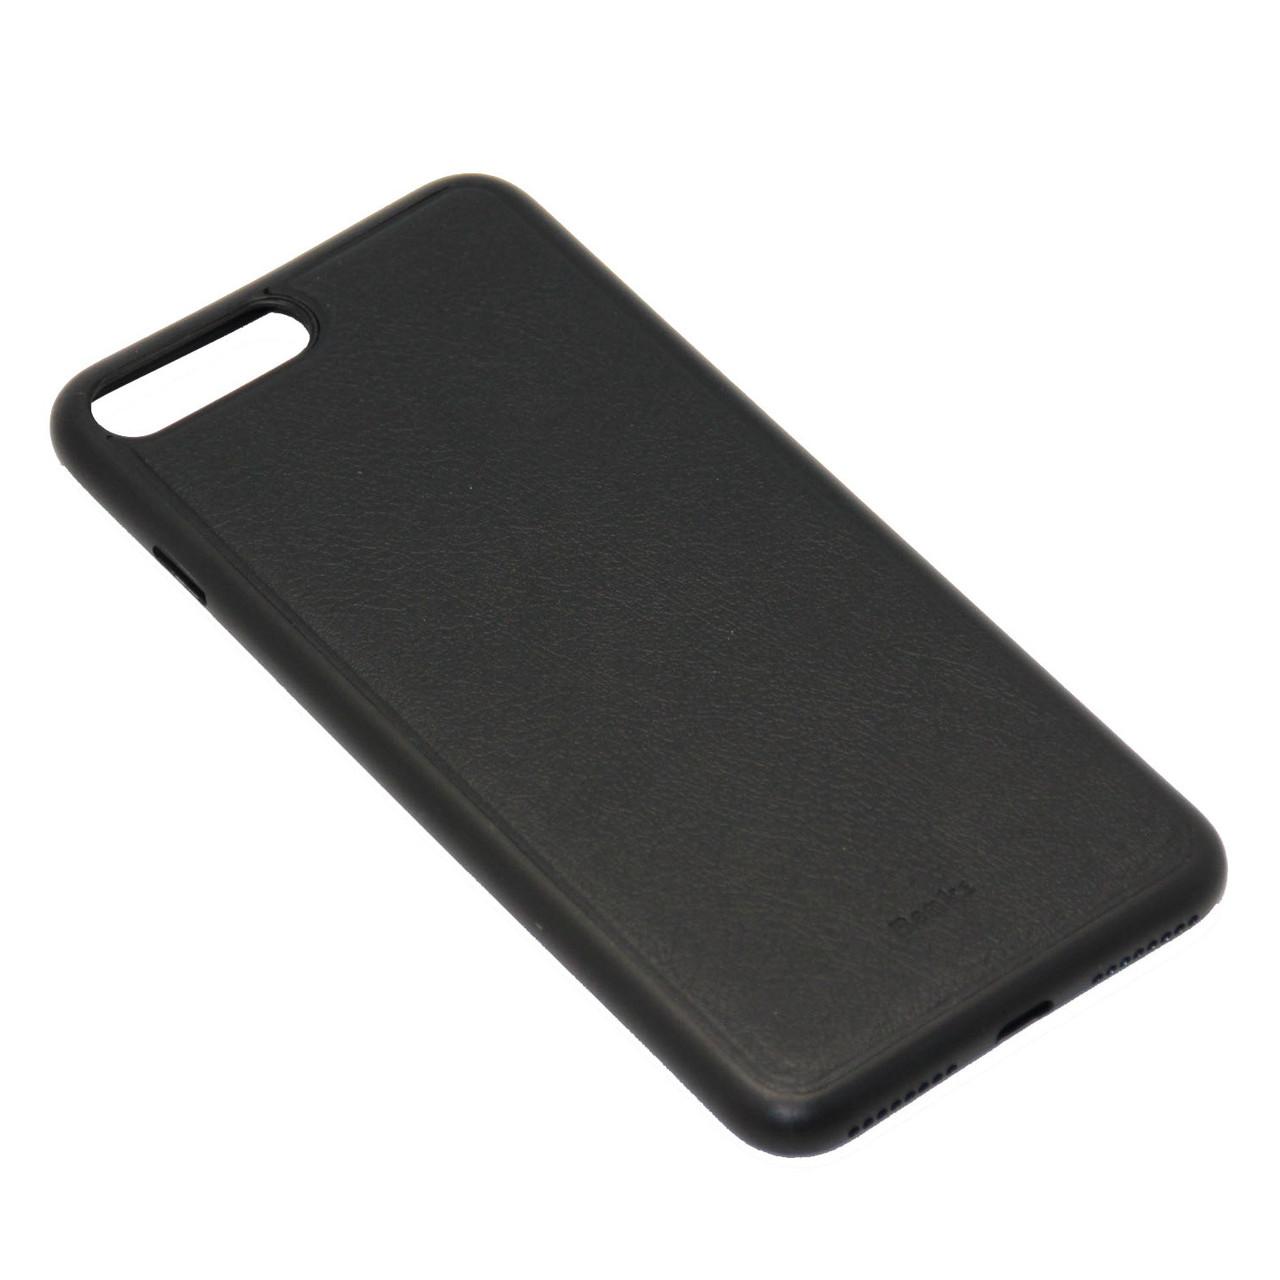 Чехол Benks iPhone силиконовый iPhone 7 Plus